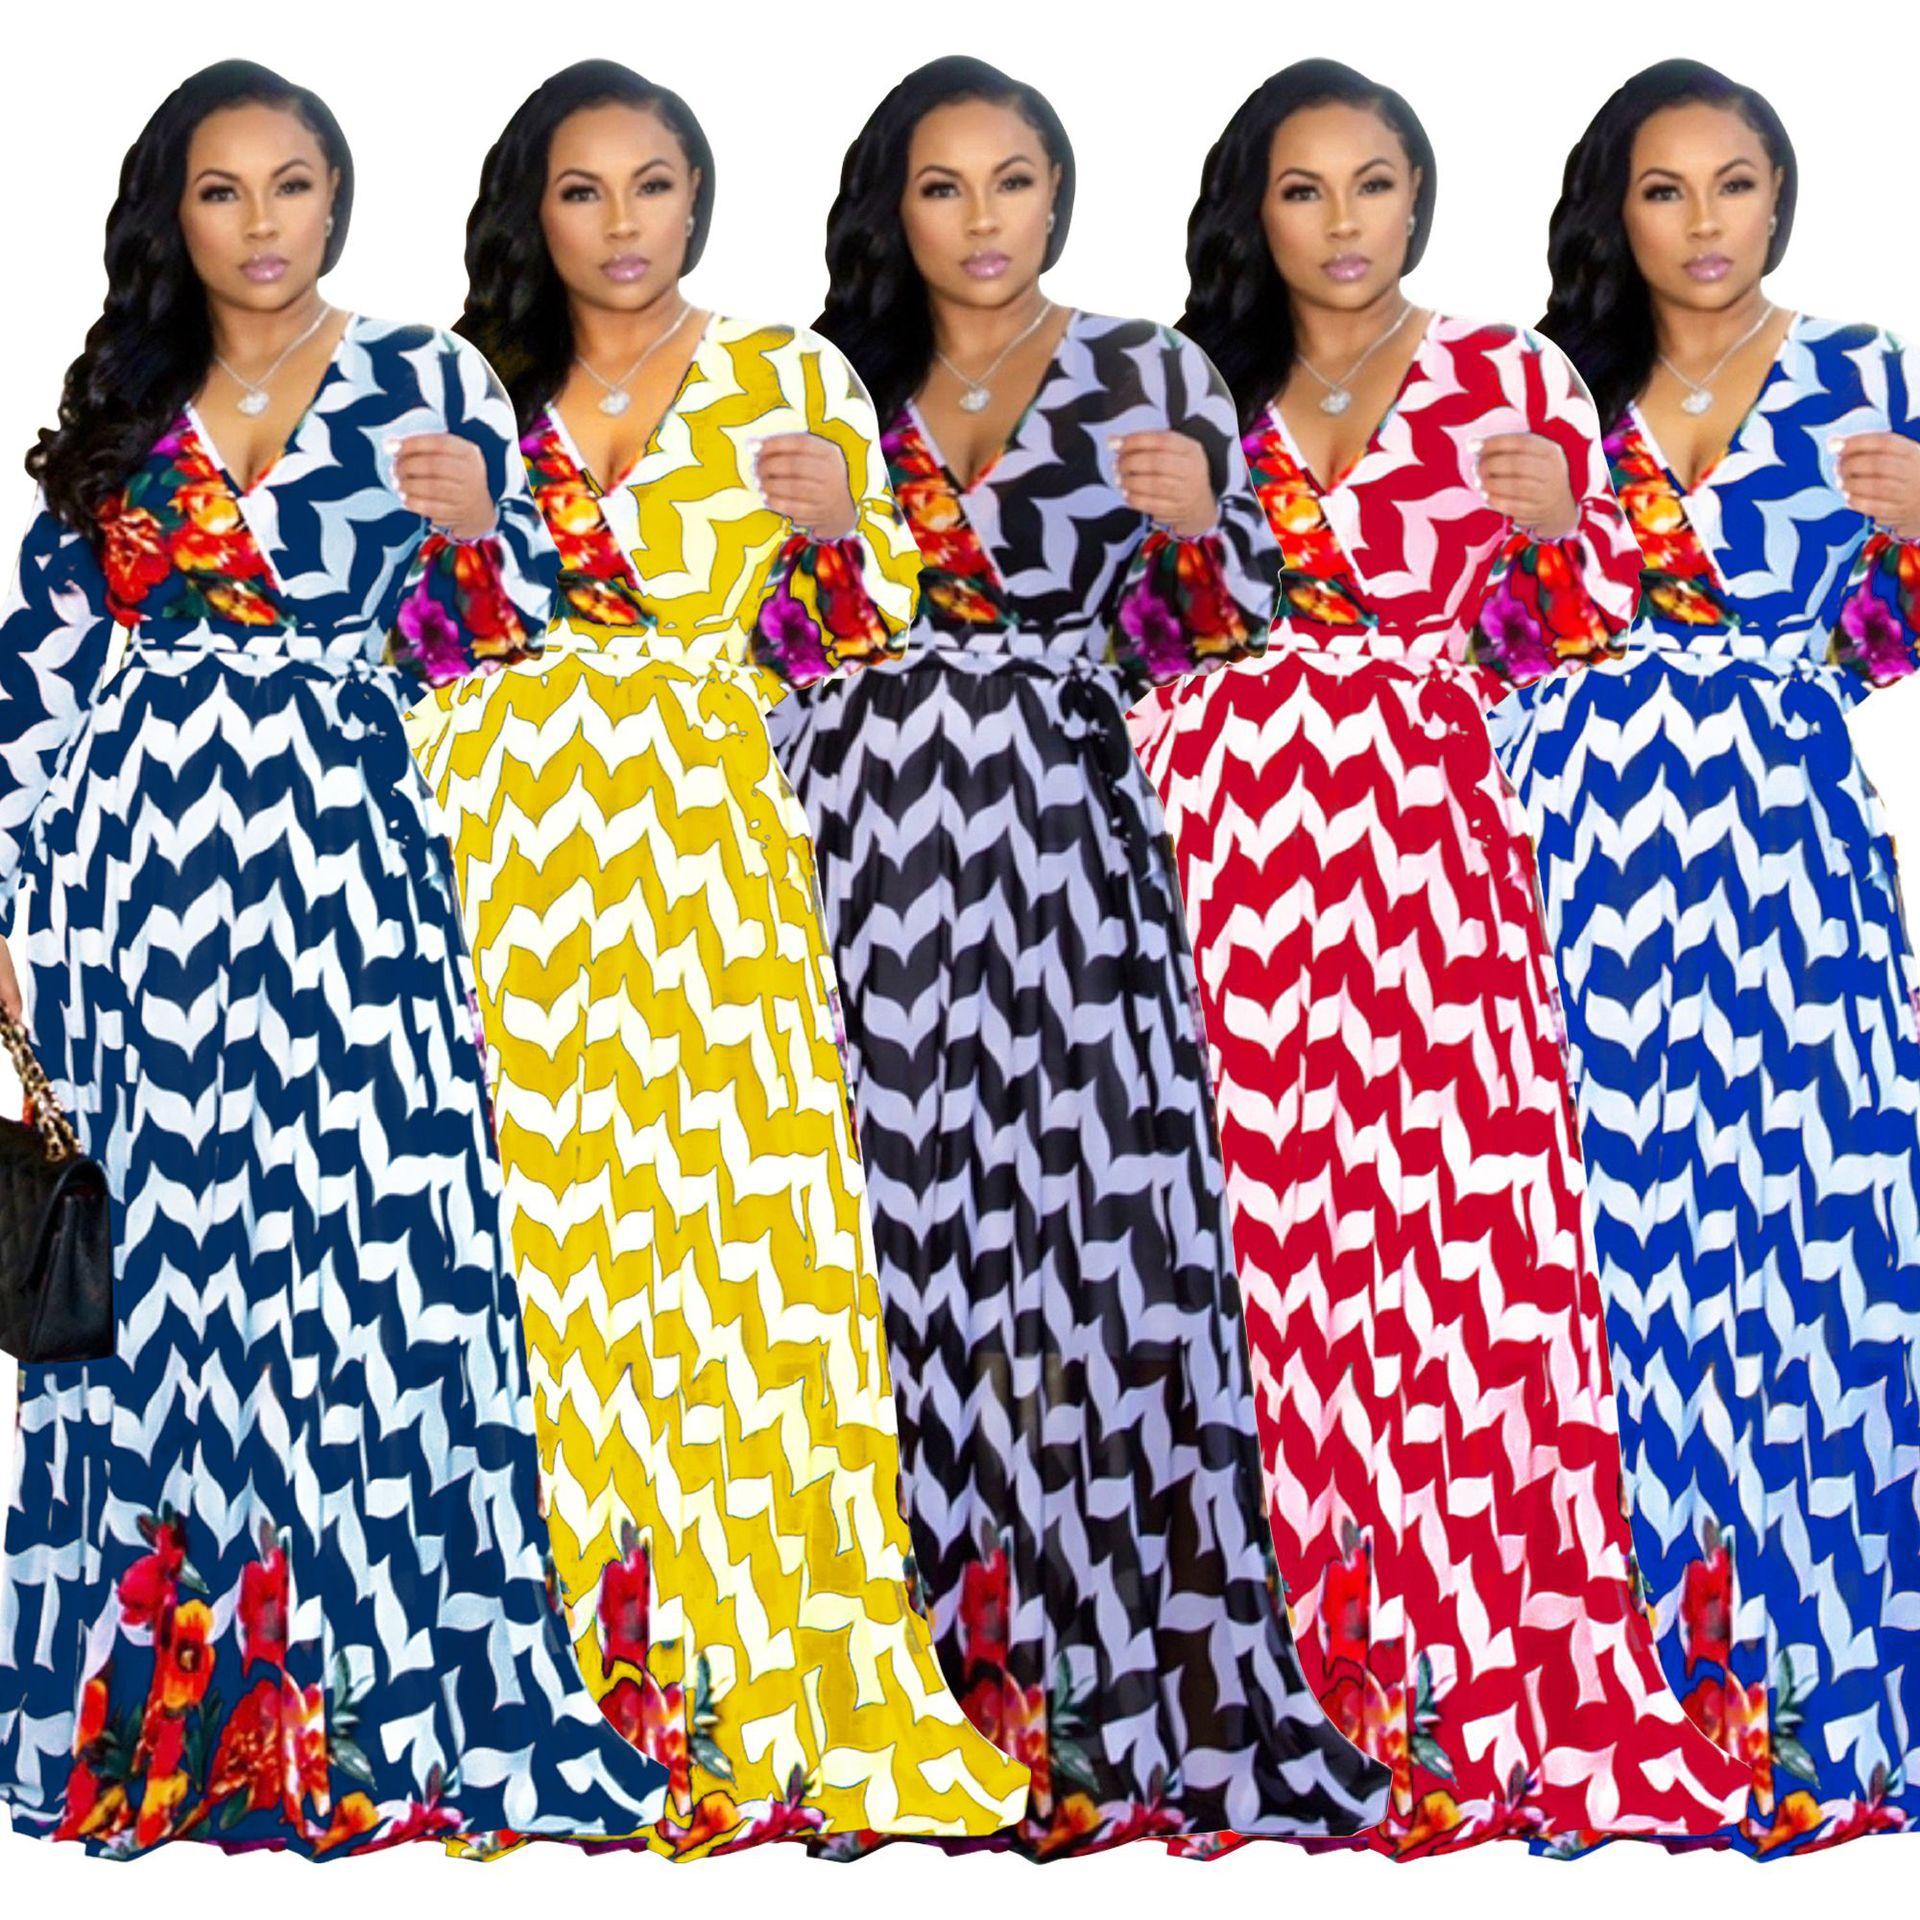 Rainbow Tie Dye Chiffon Maxi Dress Women Deep V Neck Long Lantern Sleeve Bohemian Dress Summer High Waist Sash Beach Dress